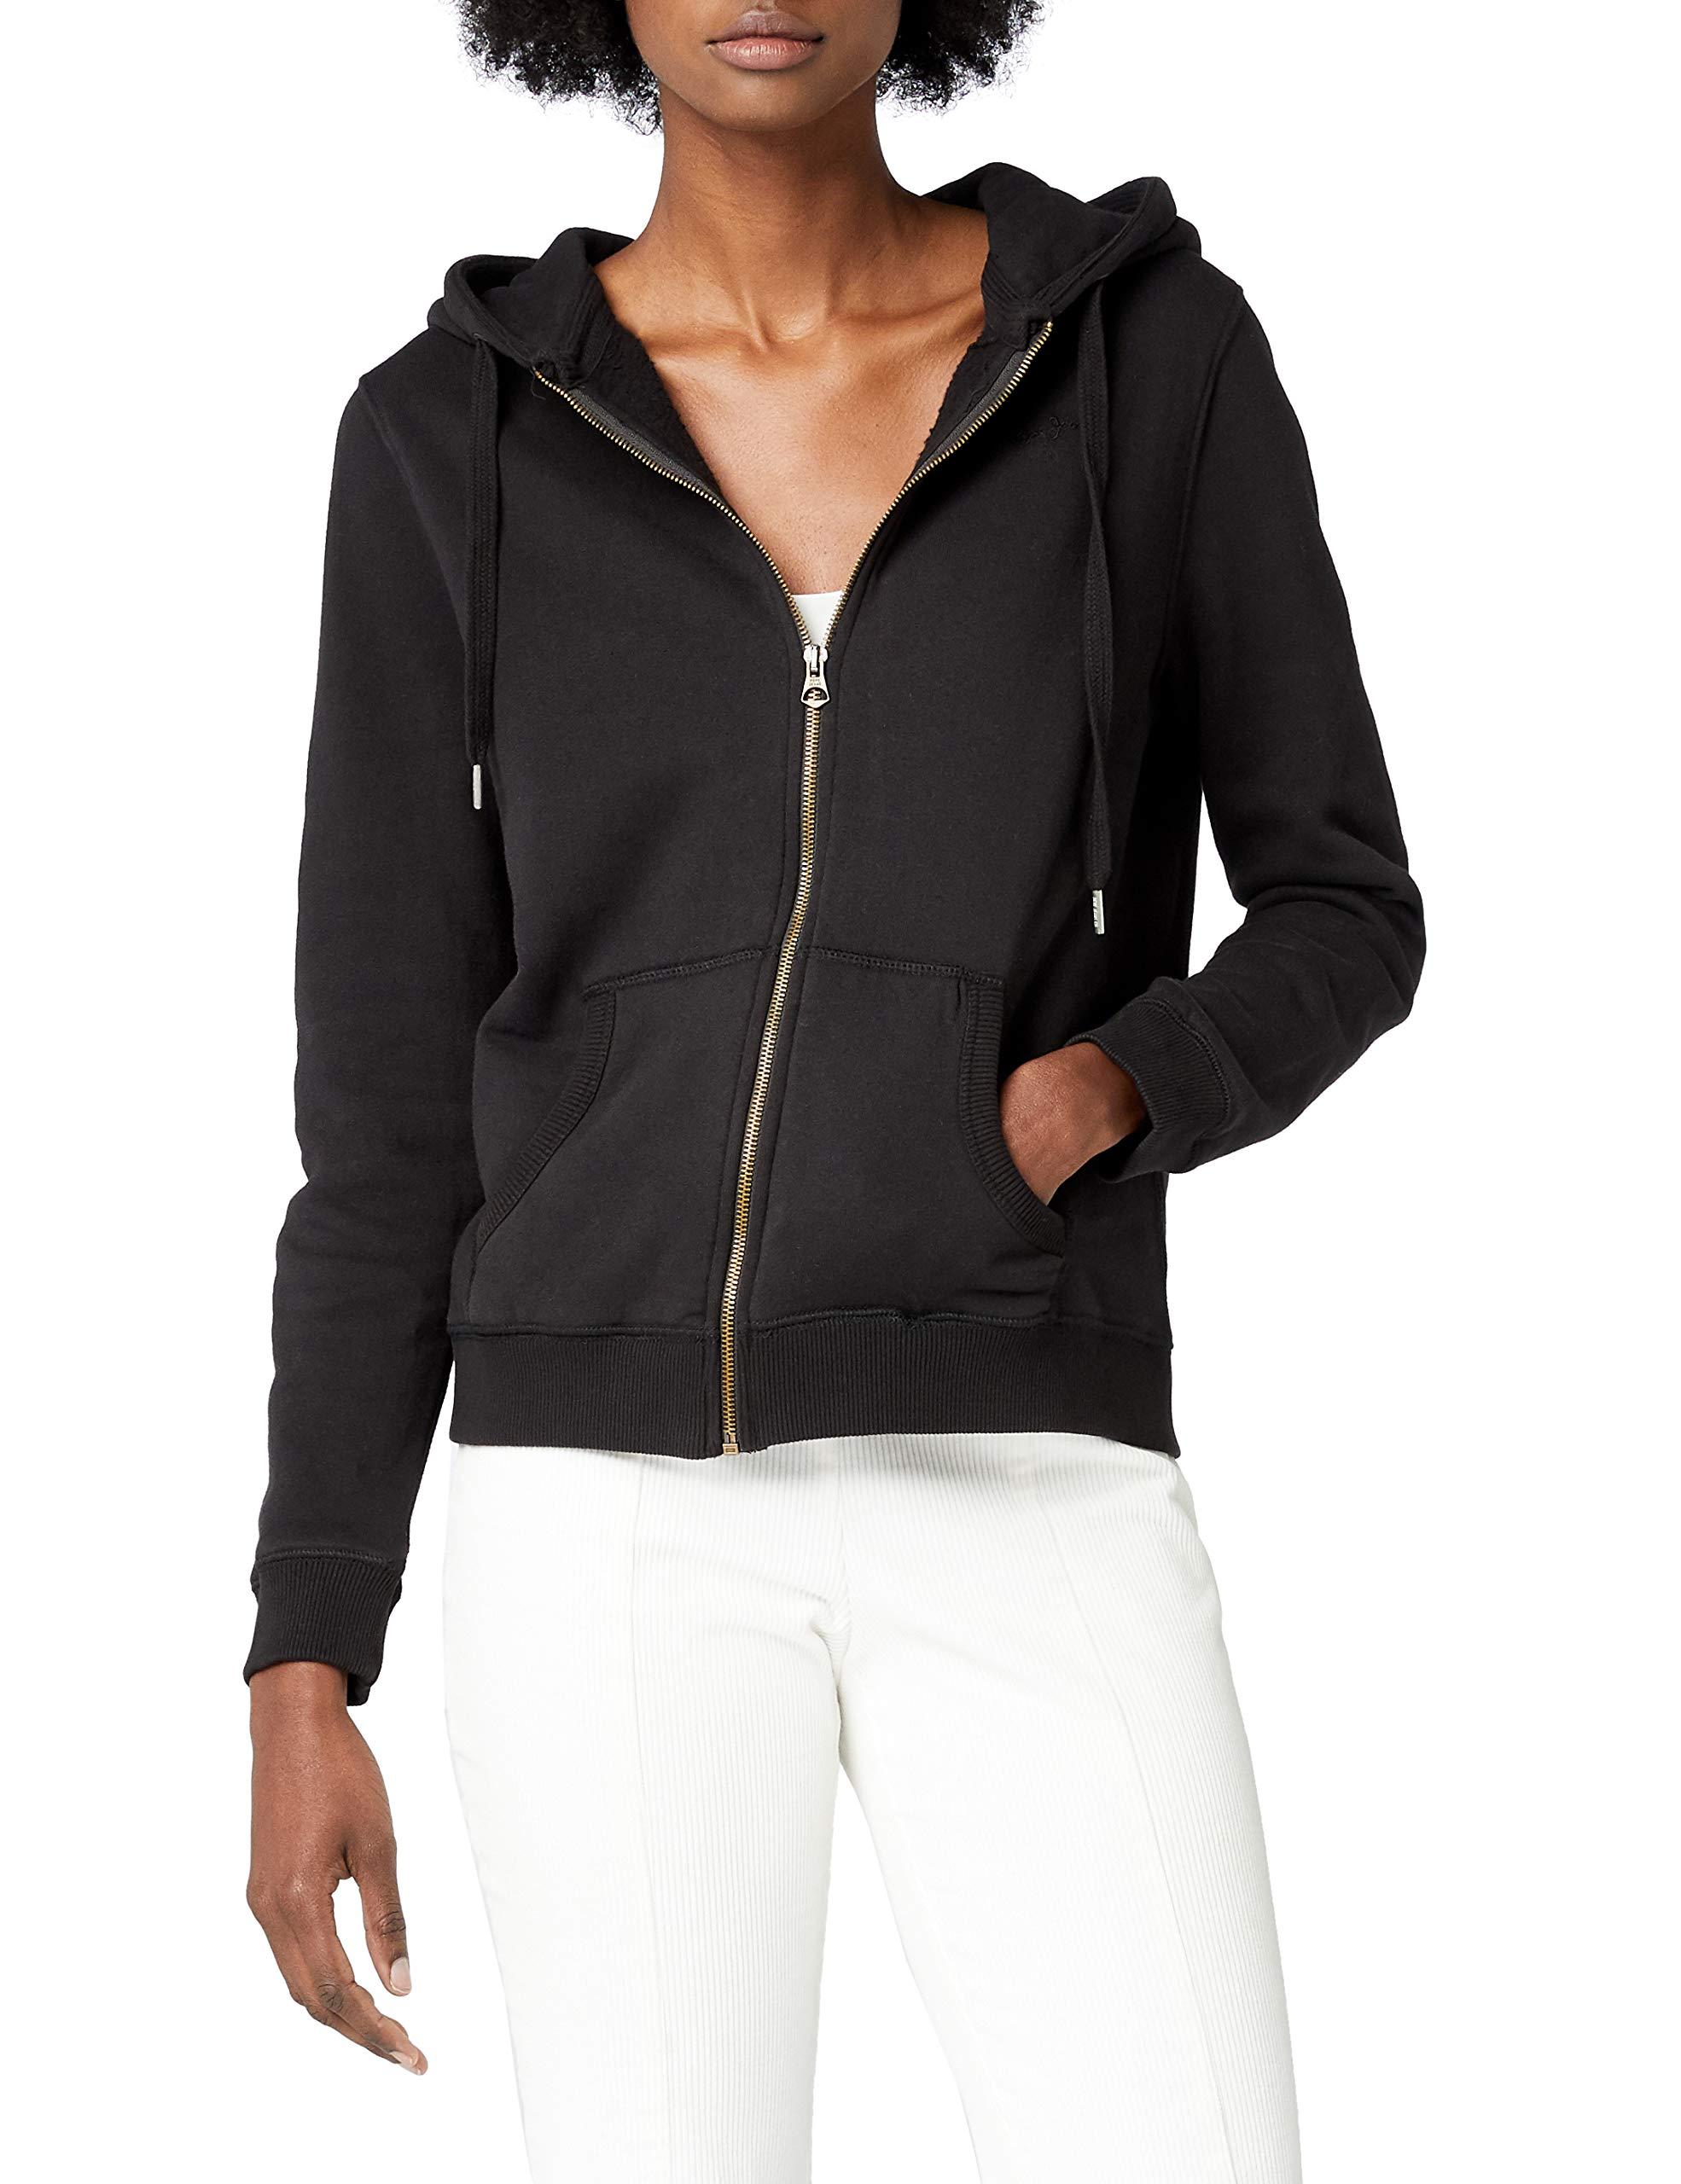 NoirblackXx Zip Femme Fabricant Sweat Ladies À xxs smalltaille shirt Capuche Jeans Pepe Thru y76gbYf